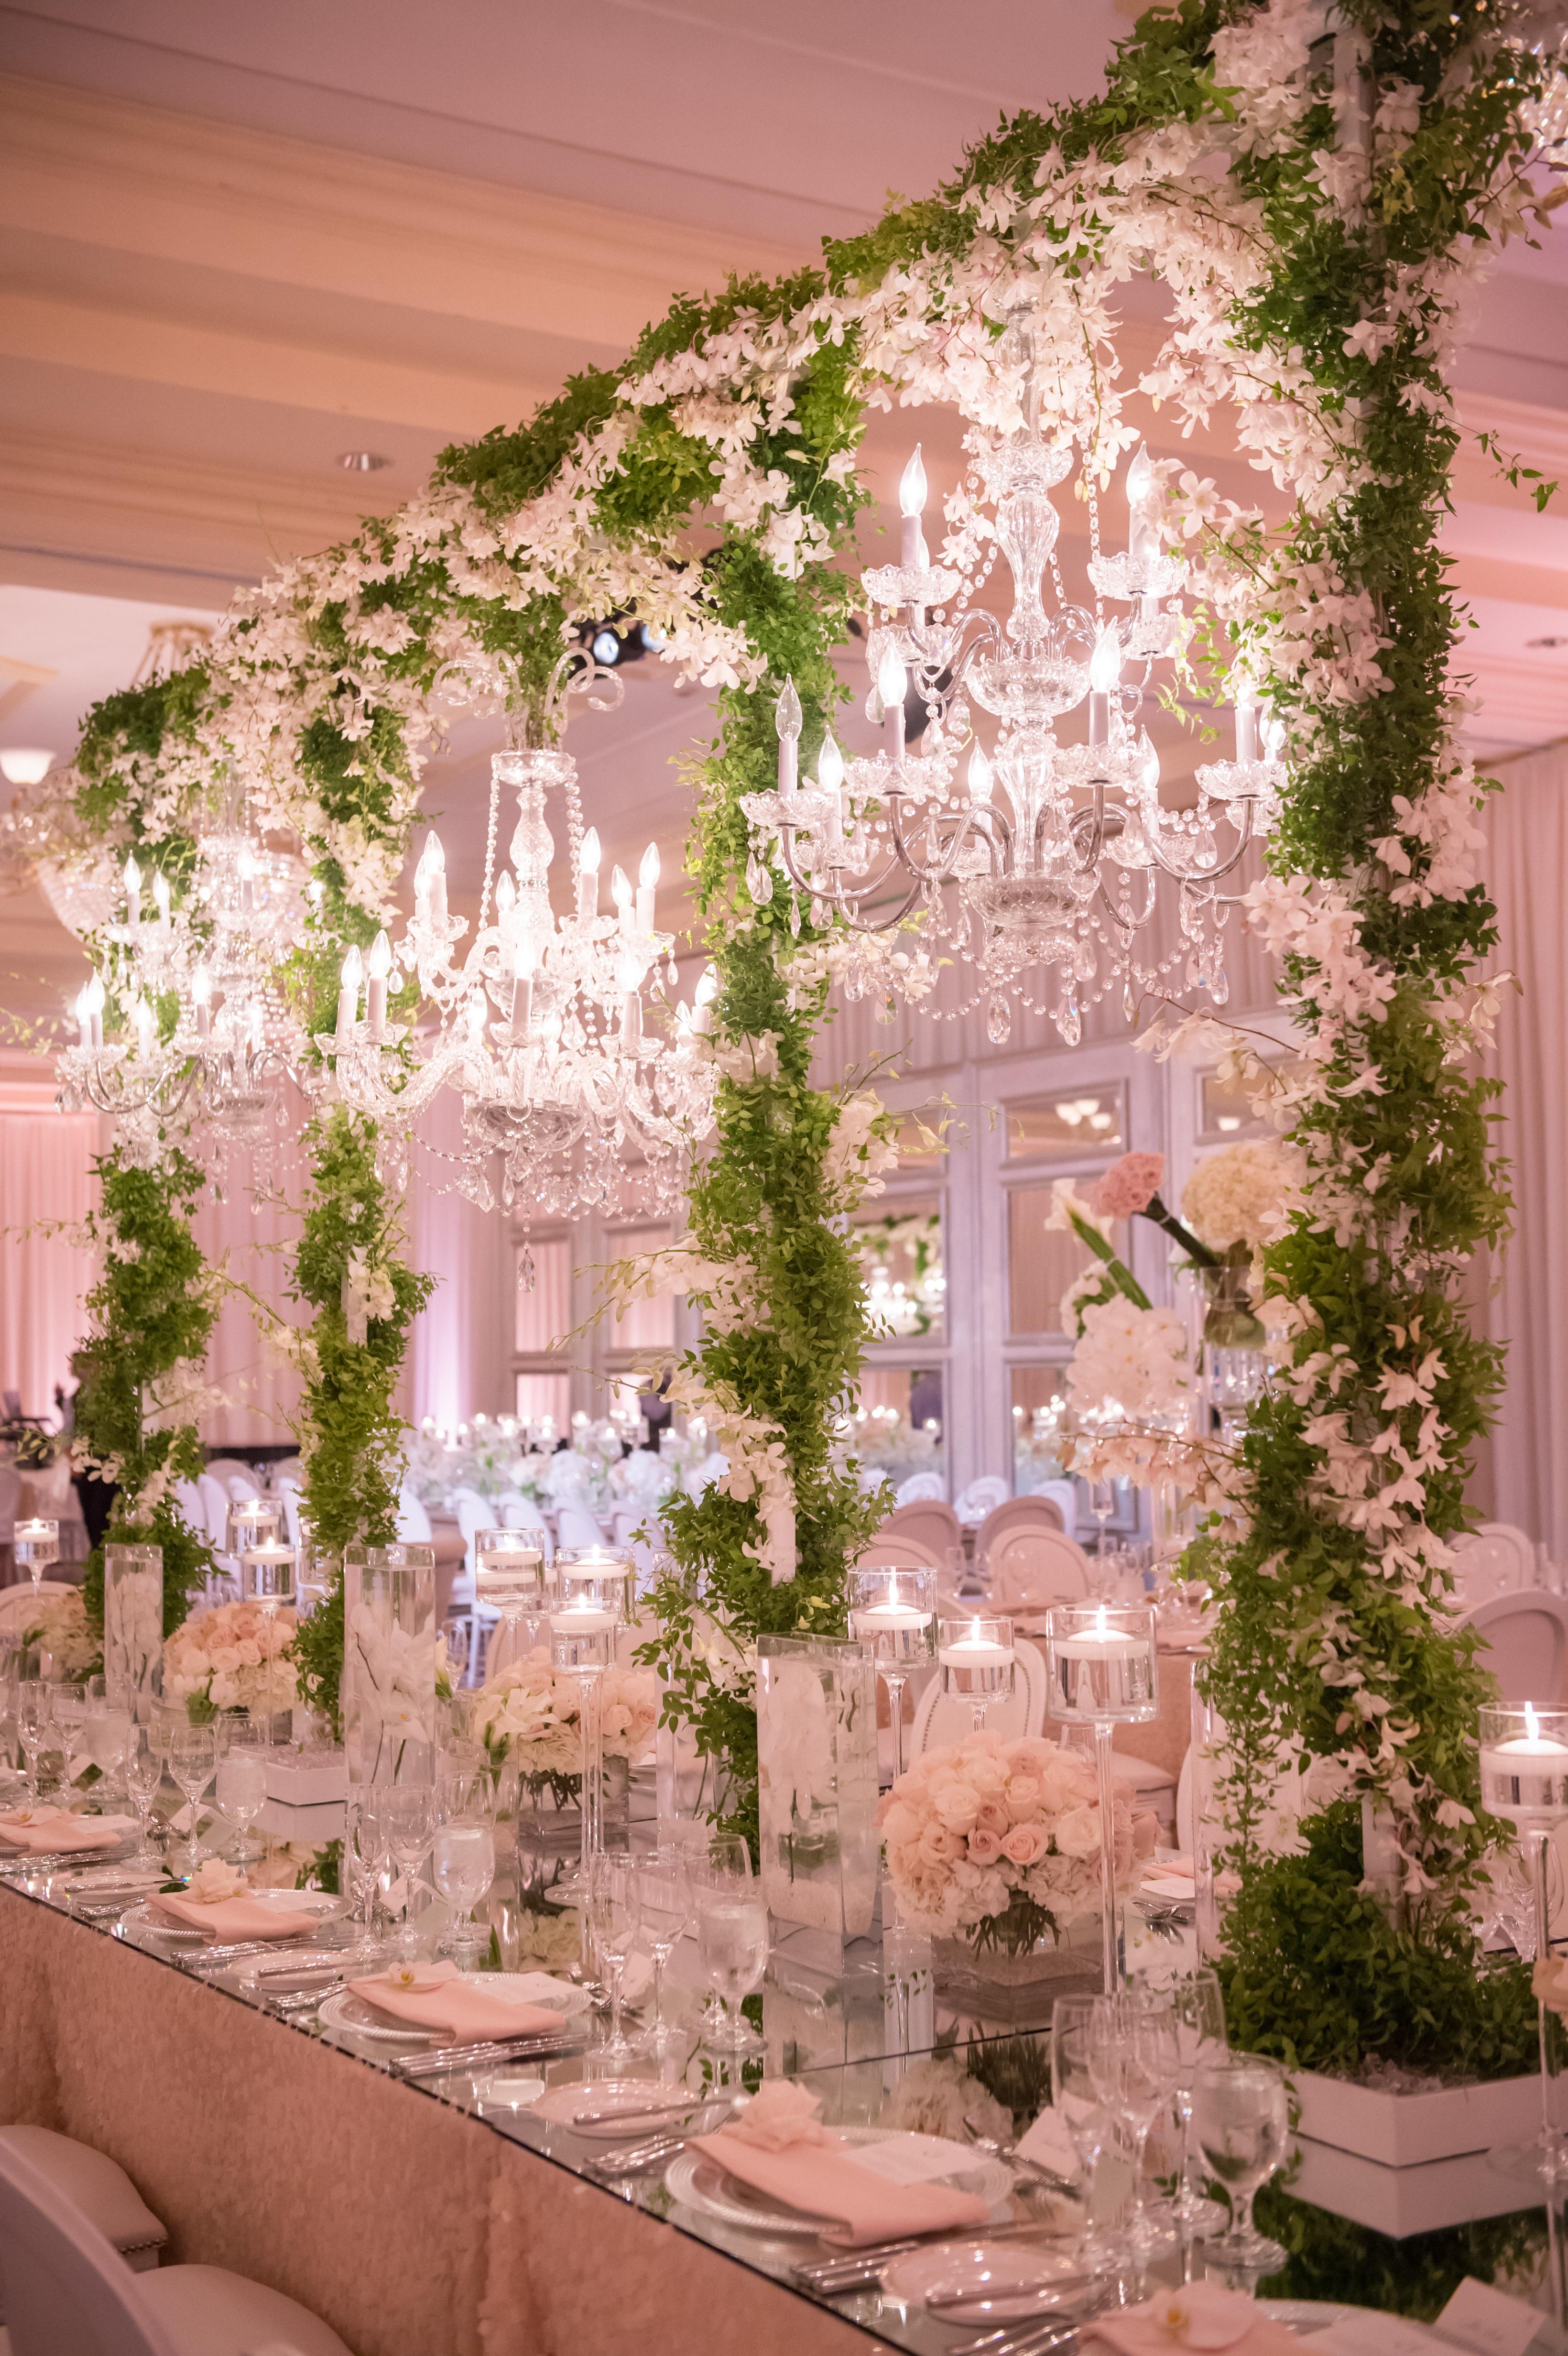 Luxury Monarch Beach Resort St. Regis Monarch Beach Orange County Featured Wedding Carats & Cake